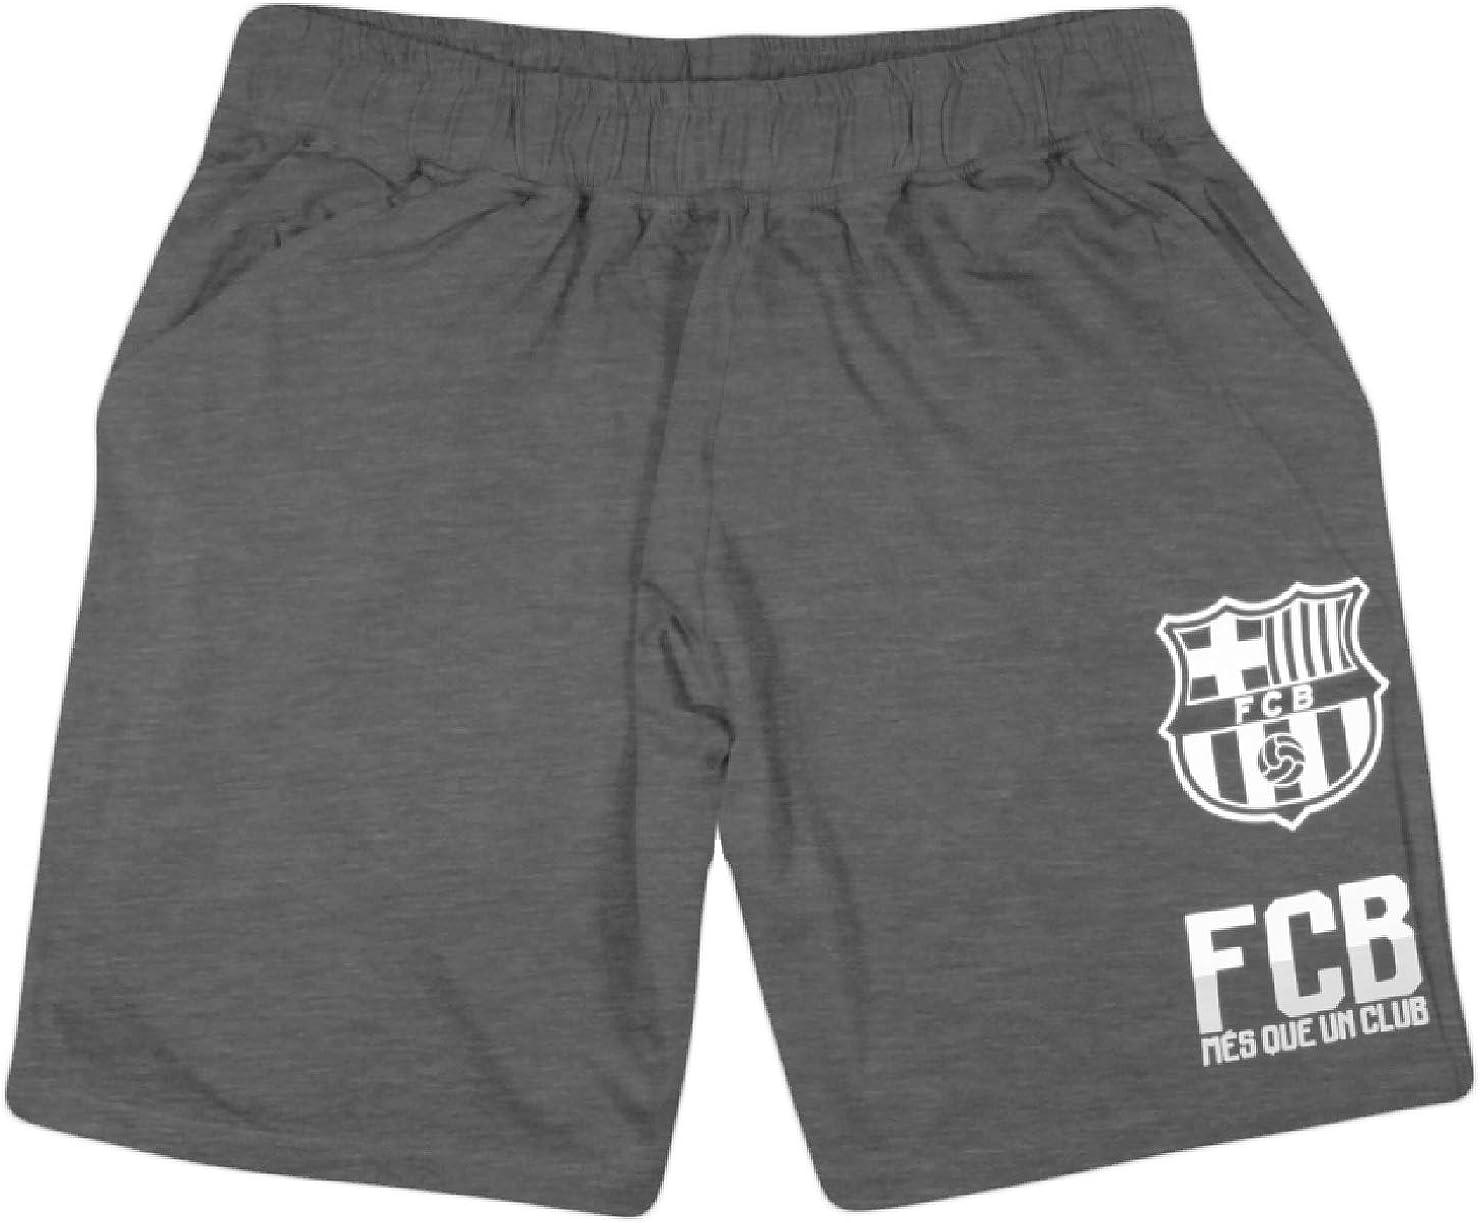 Ragazzo Futbol Club Barcelona Pantaloncini